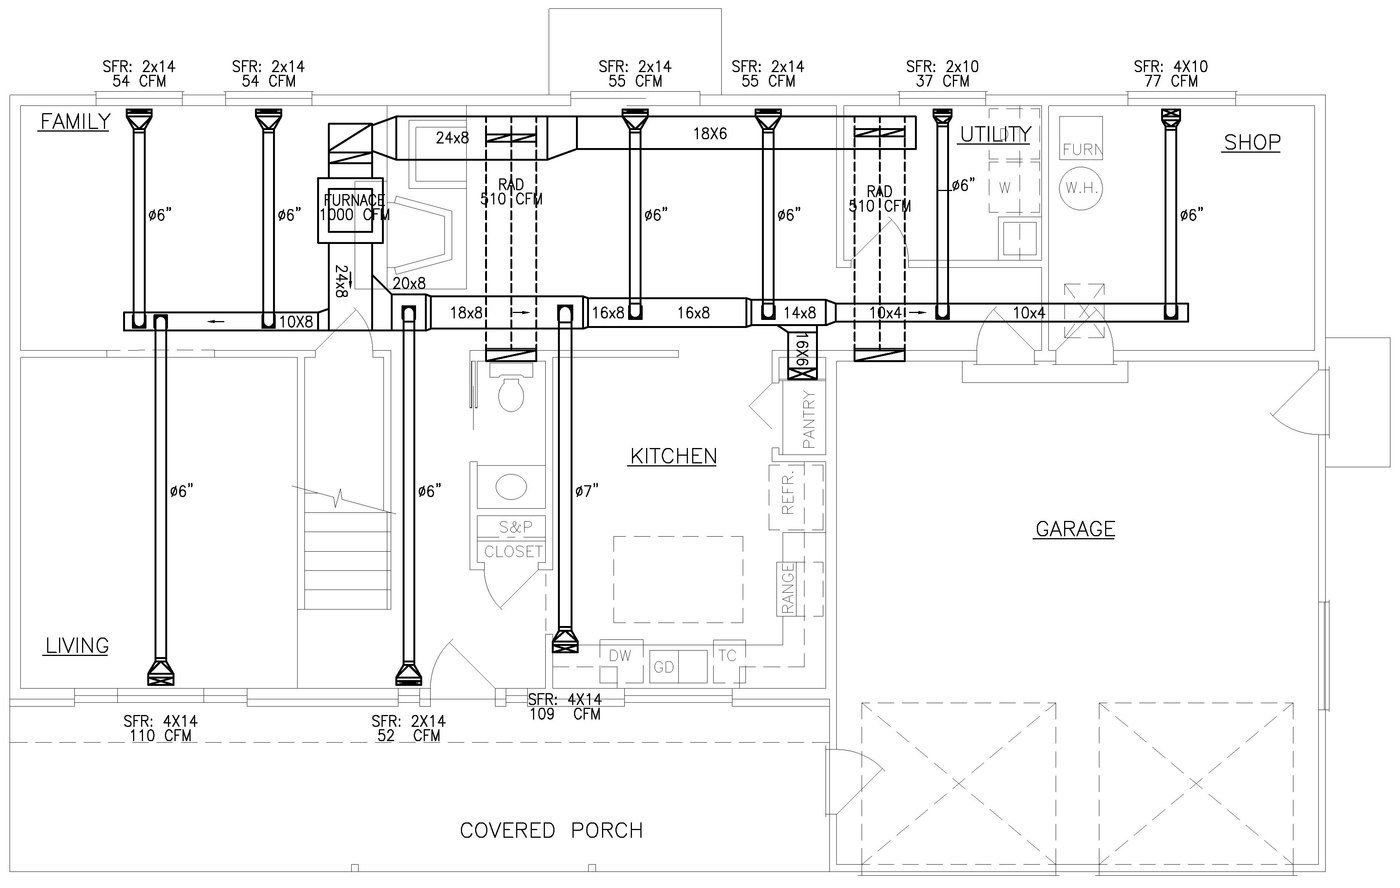 HVAC Plans by Raymond Alberga at Coroflot.com   Hvac system design, Hvac,  Plumbing installation   Hvac Drawing Plans      Pinterest